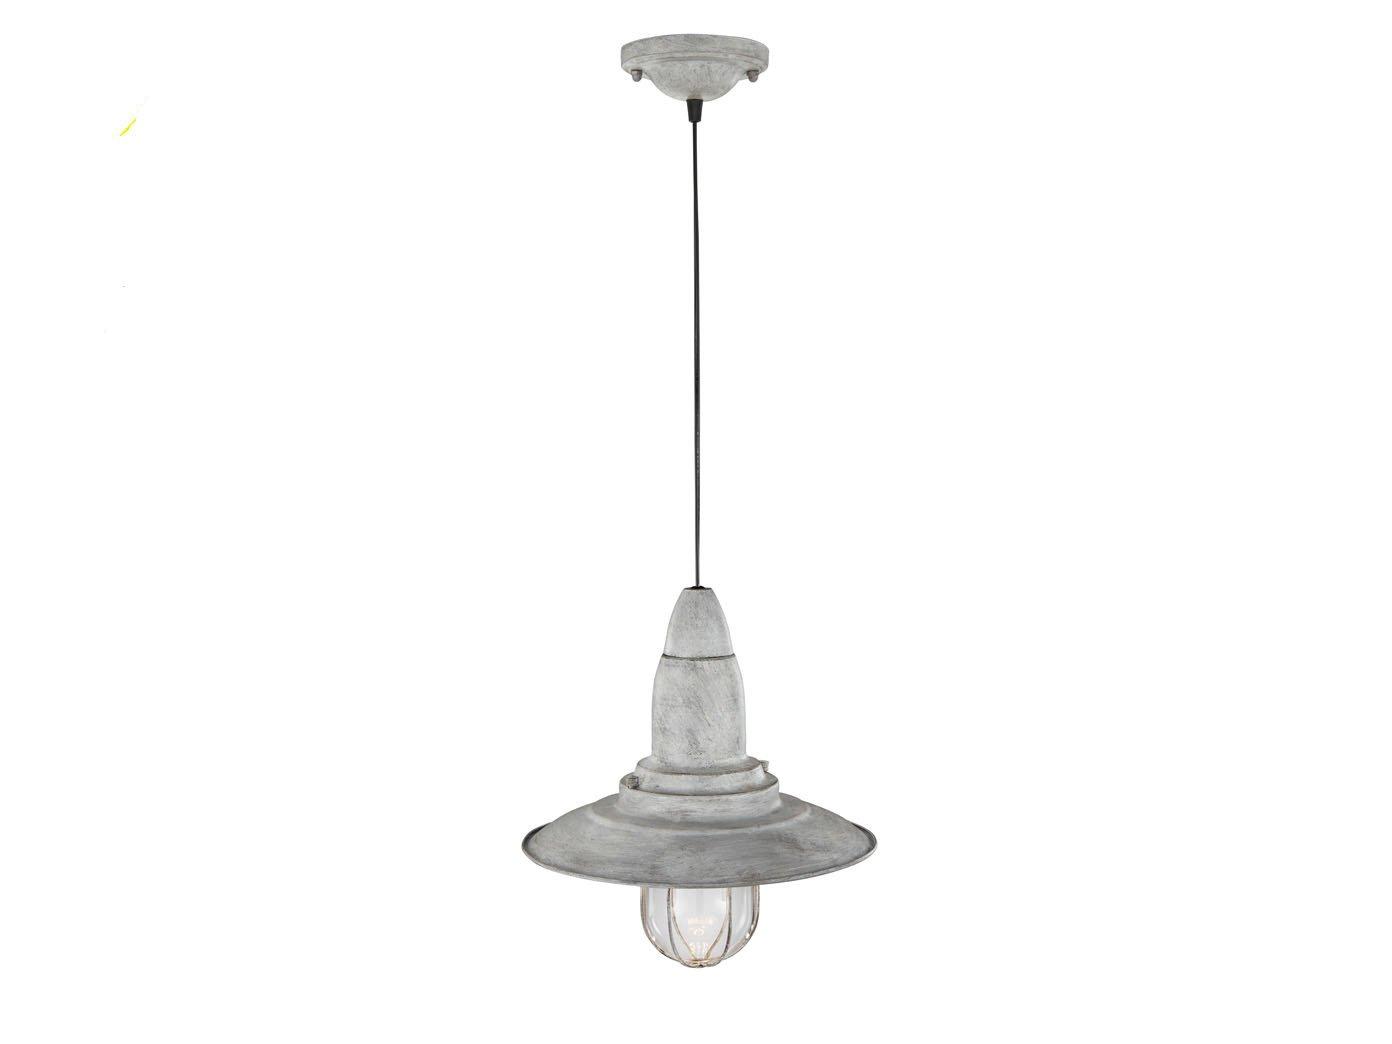 Vintage Pendelleuchte in Grau antik antik antik Ø 32cm, mit LED Dekor Leuchmittel 24c631